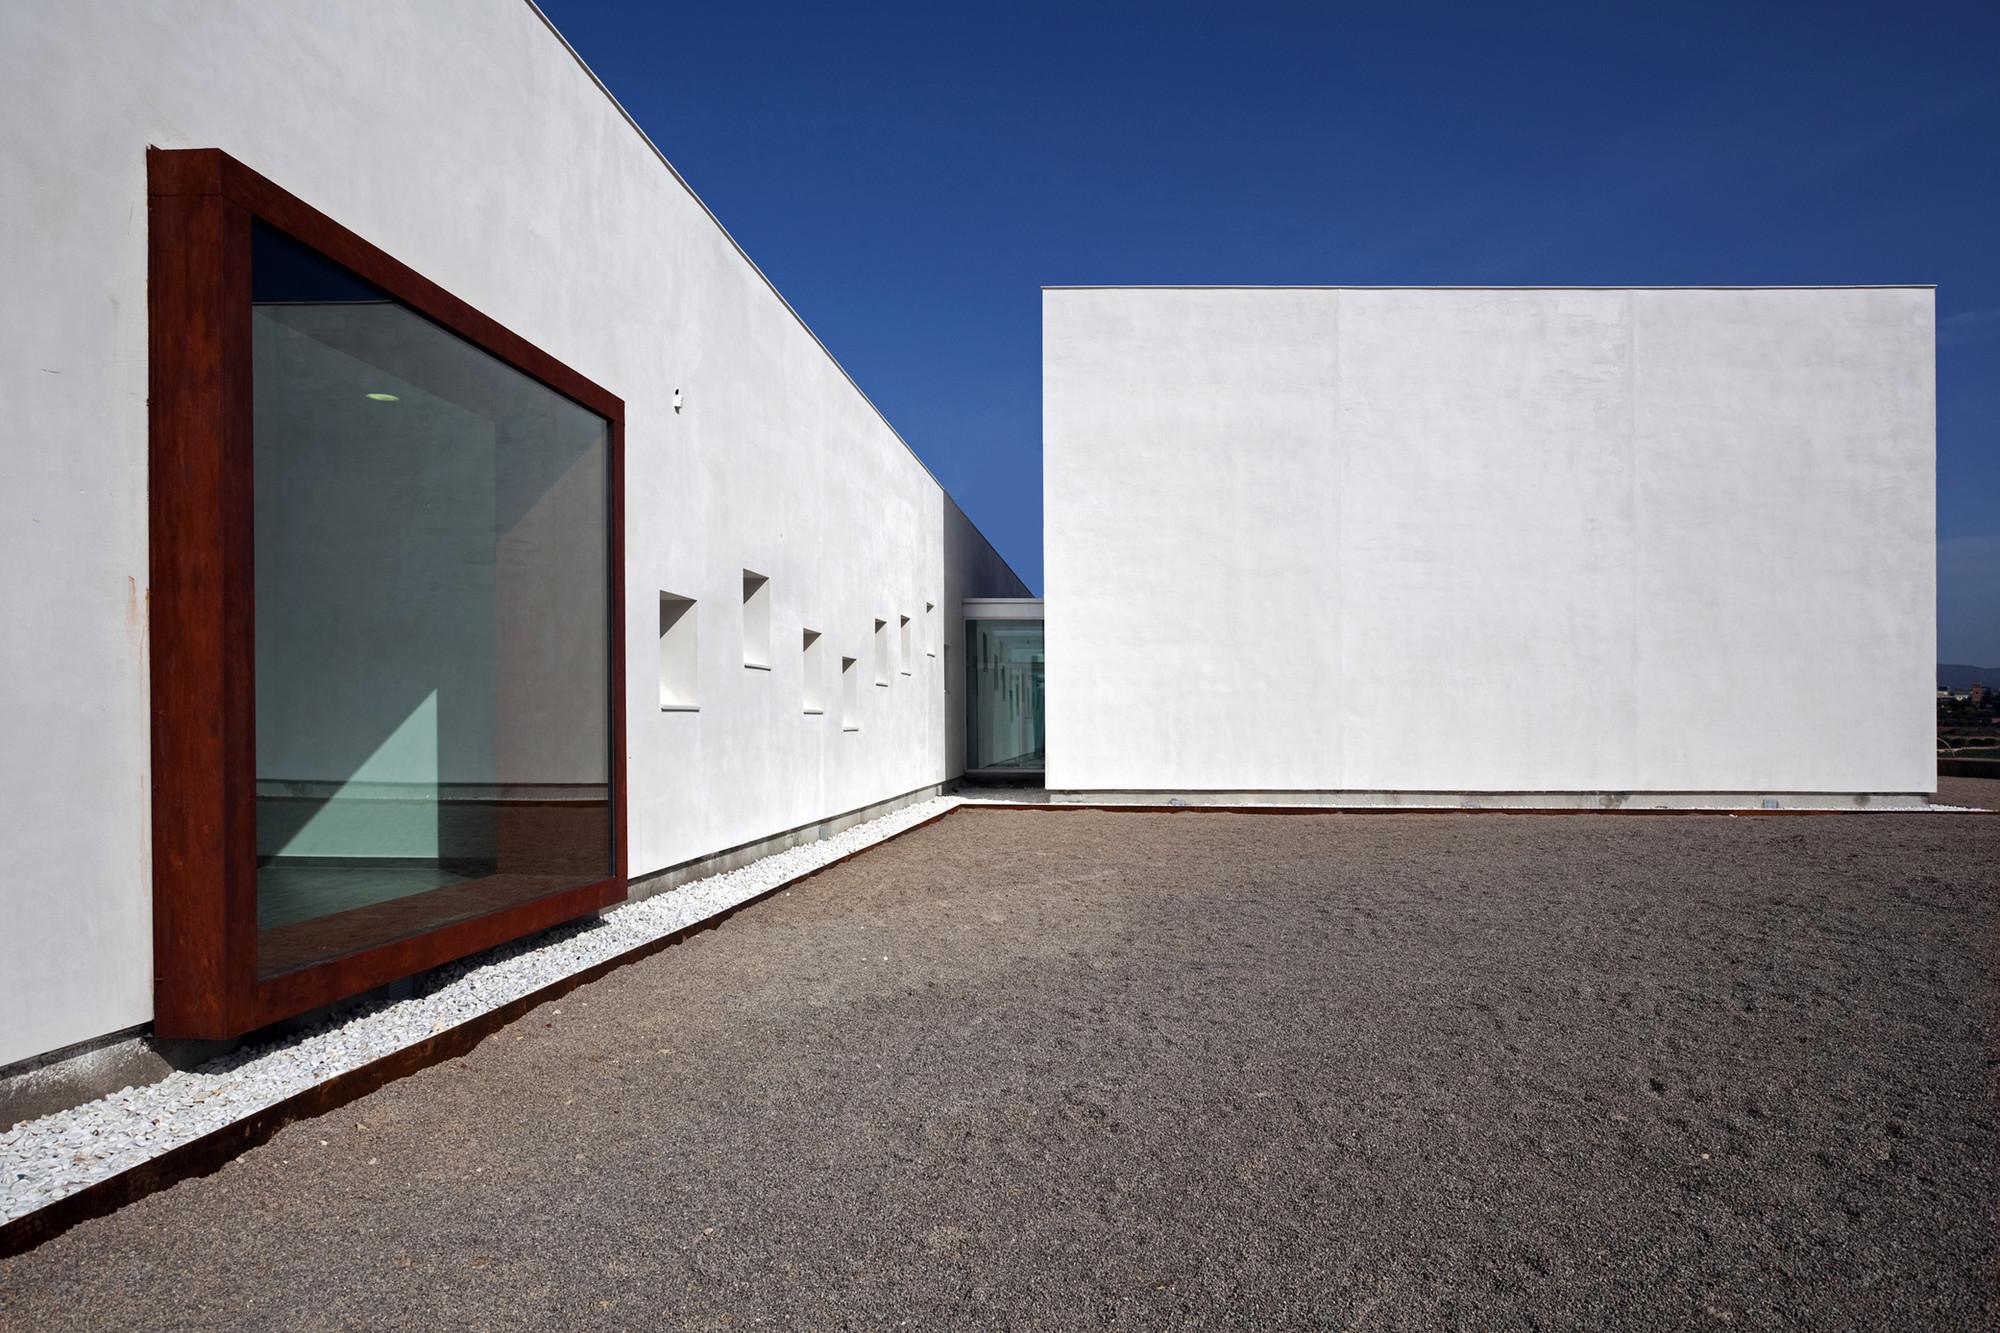 Dance School in Lliria / hidalgomora arquitectura, © Diego Opazo